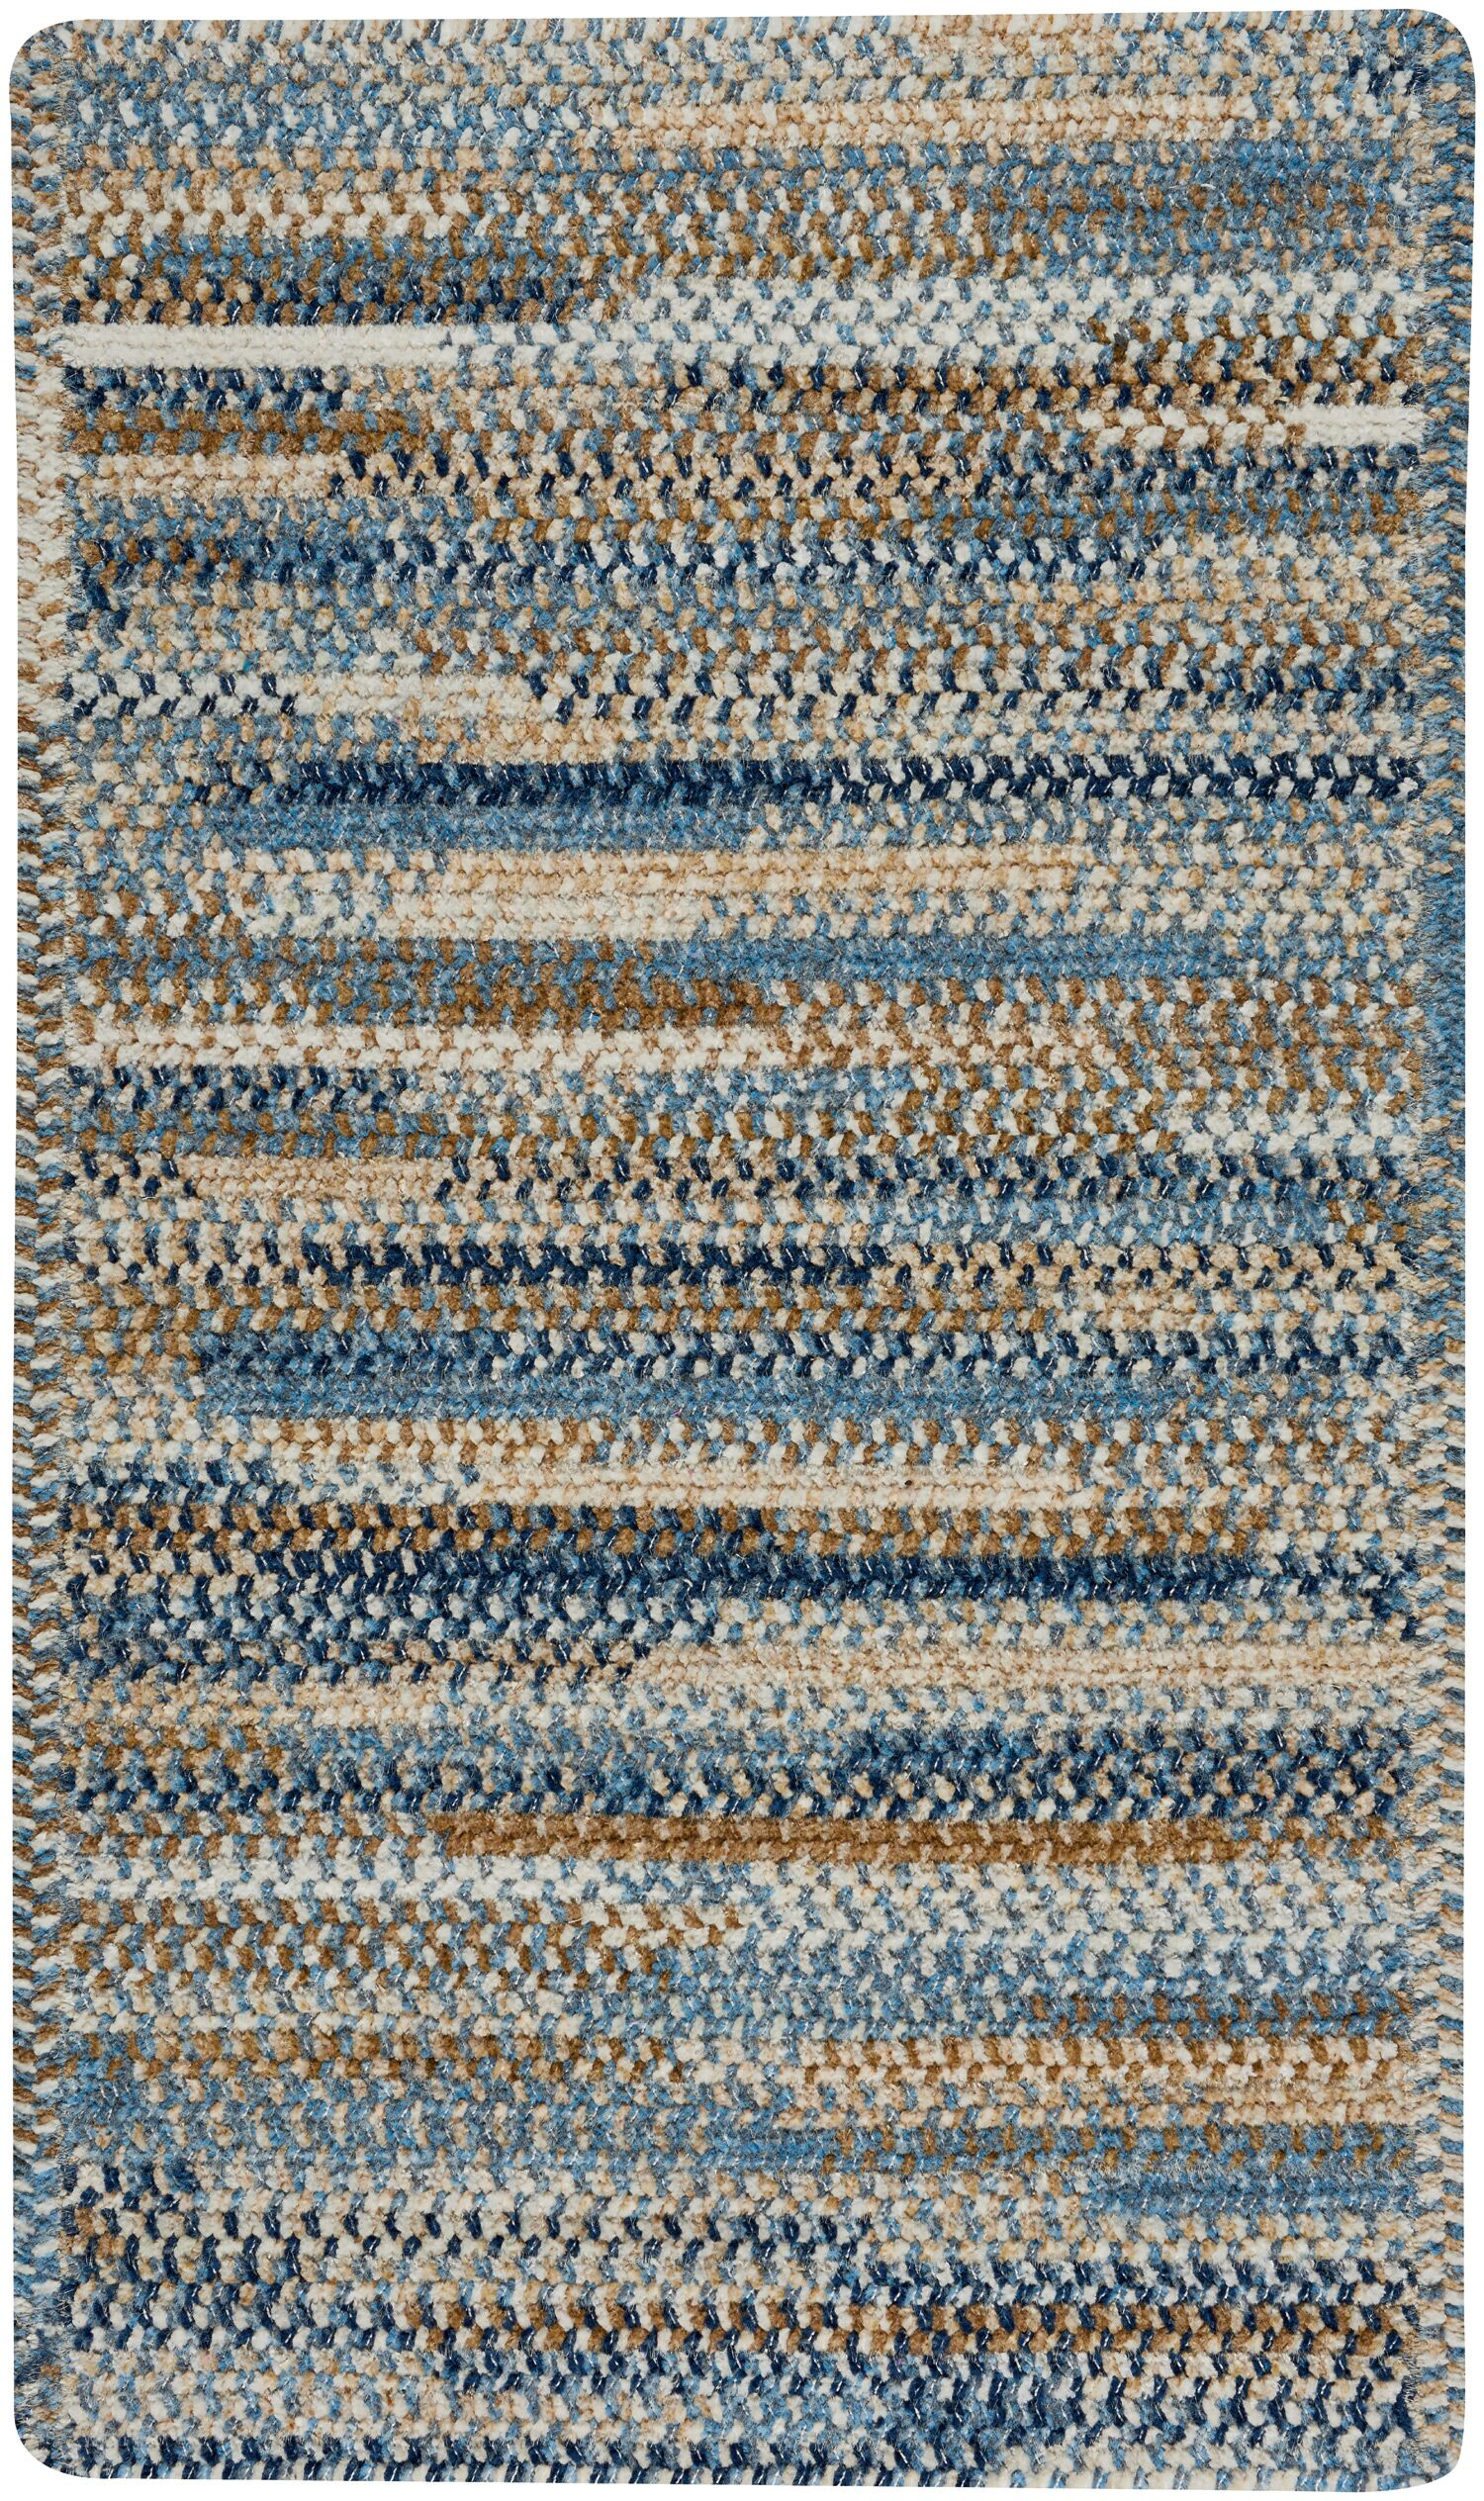 Eben Blue Area Rug Rug Size: Rectangle 11'4